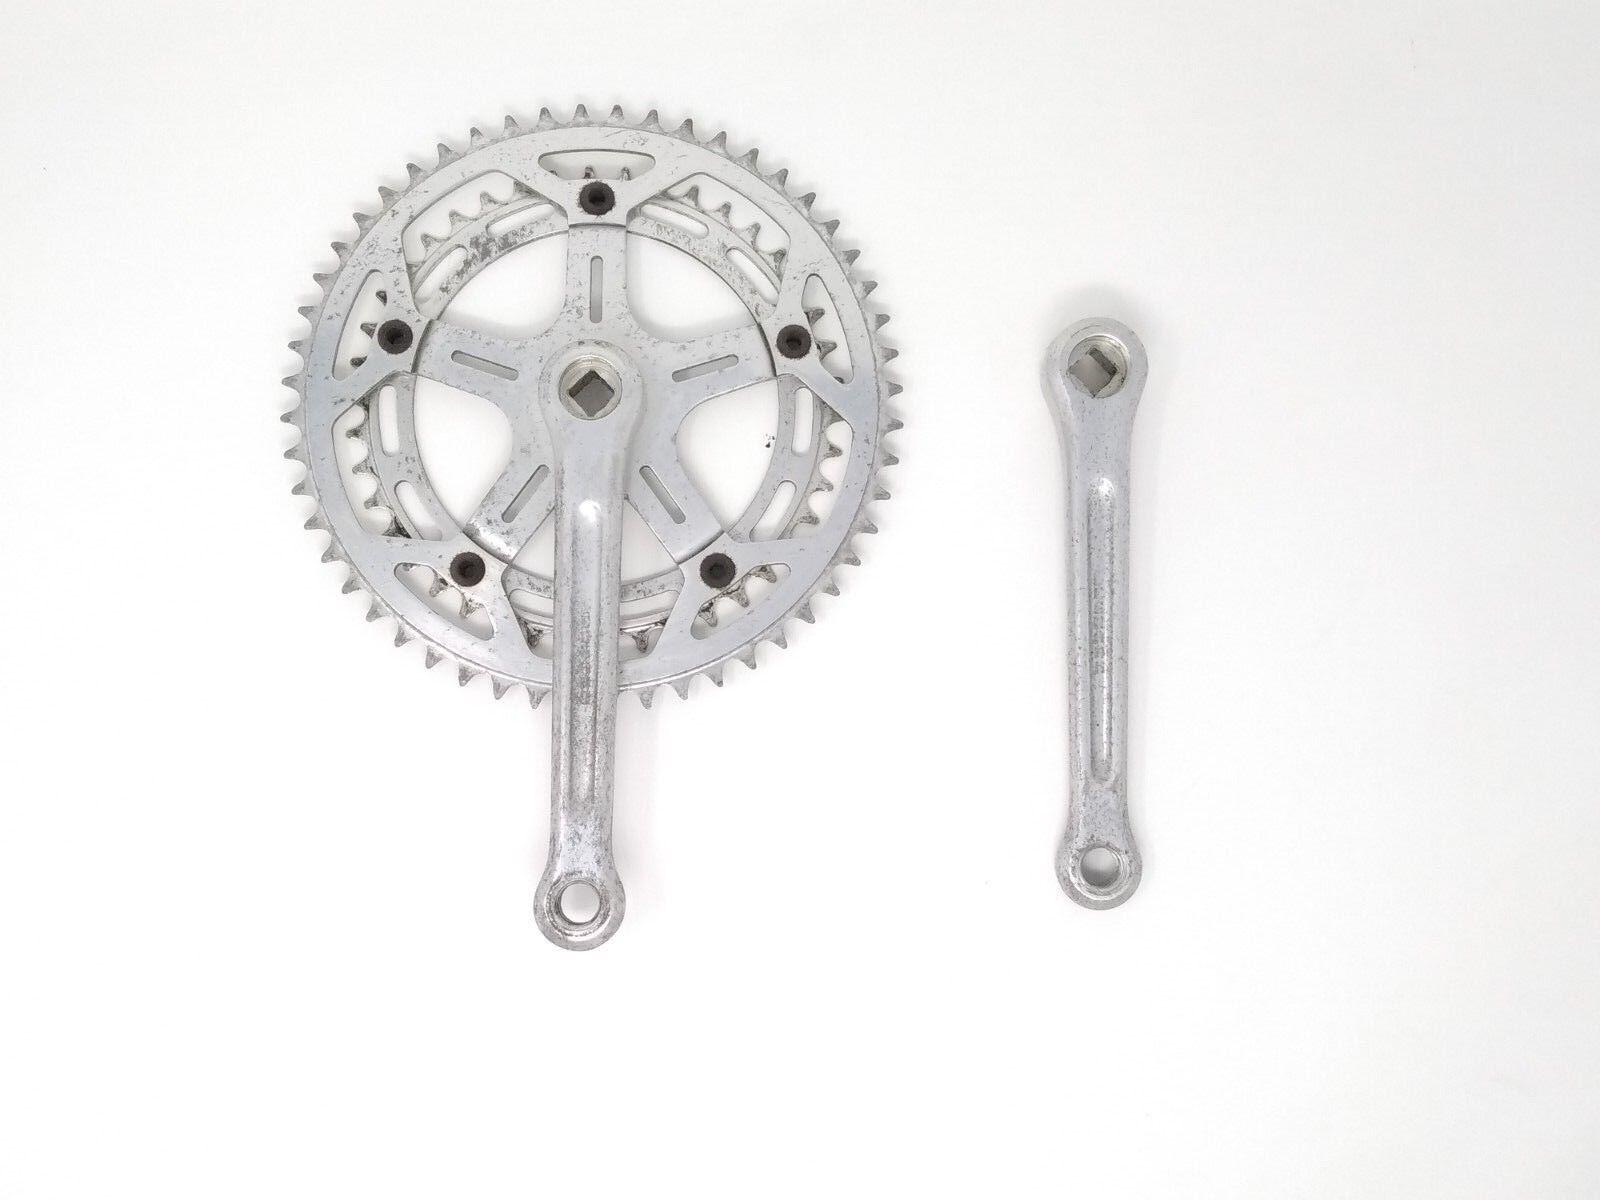 Vintage Kurbelgarnitur crankset Legnano 170 52 42 42 42 2d2cb7